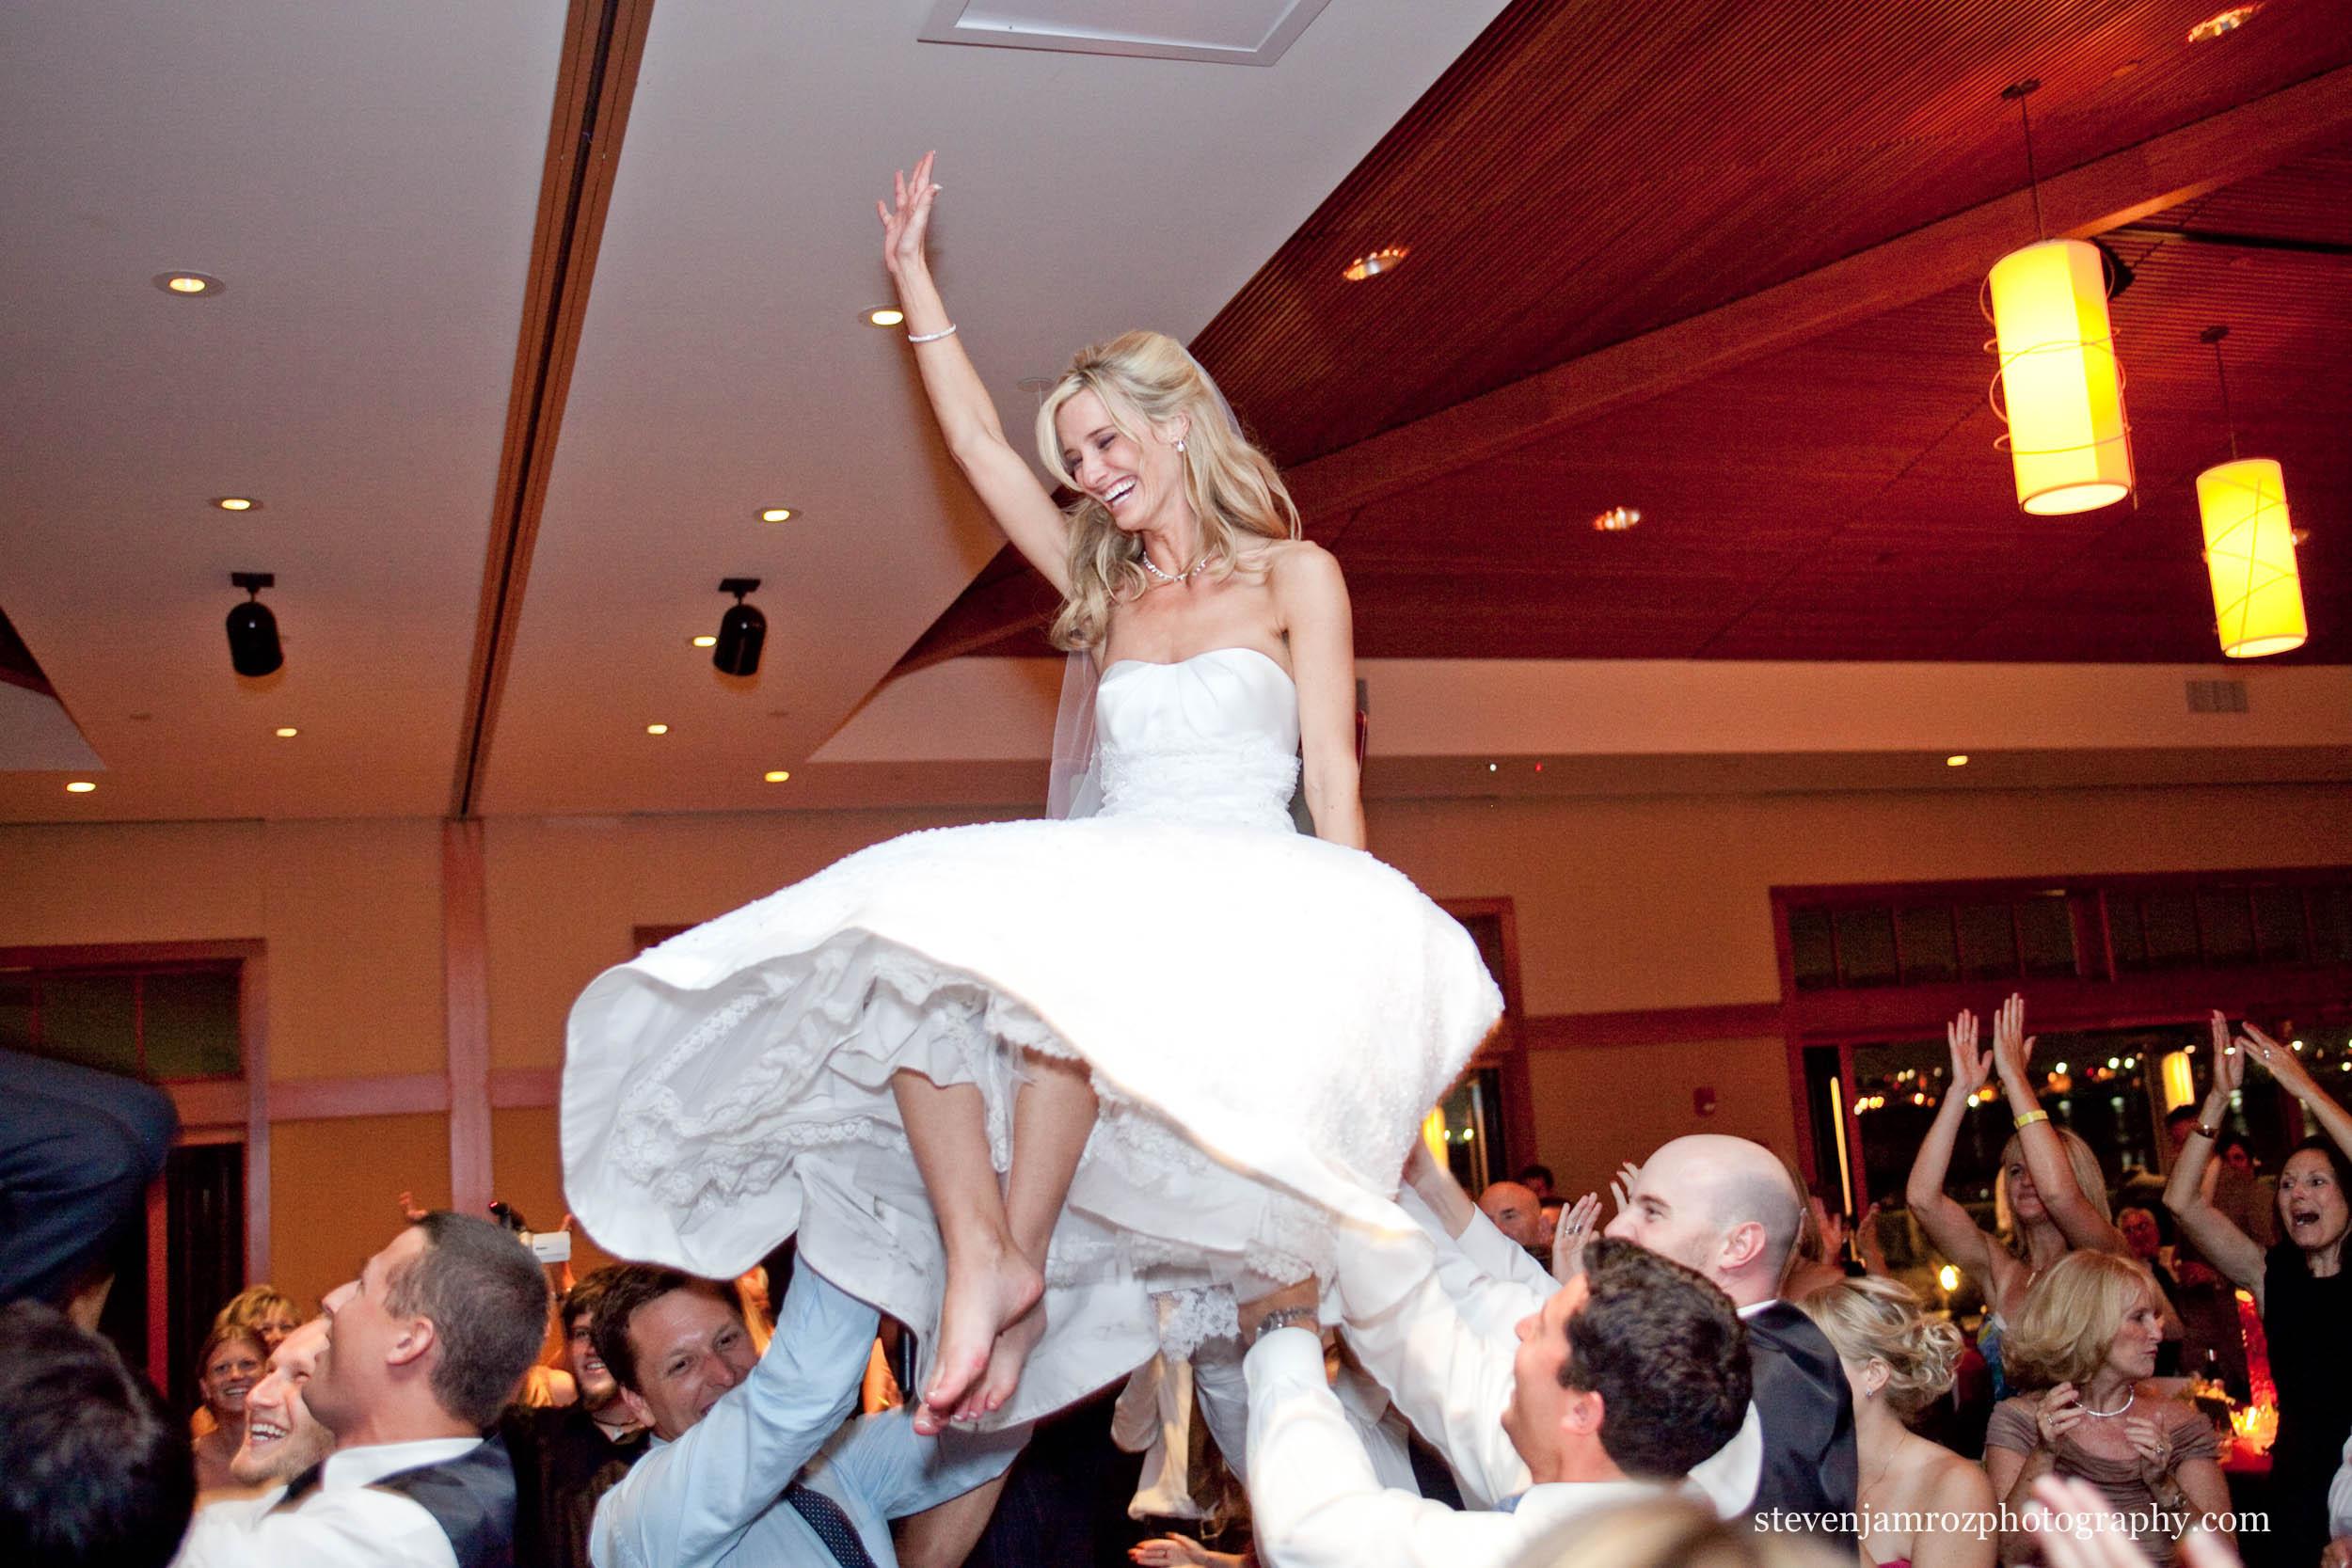 party-wedding-chair-dance-raleigh-wedidng-nc-steven-jamroz-photography-0436.jpg